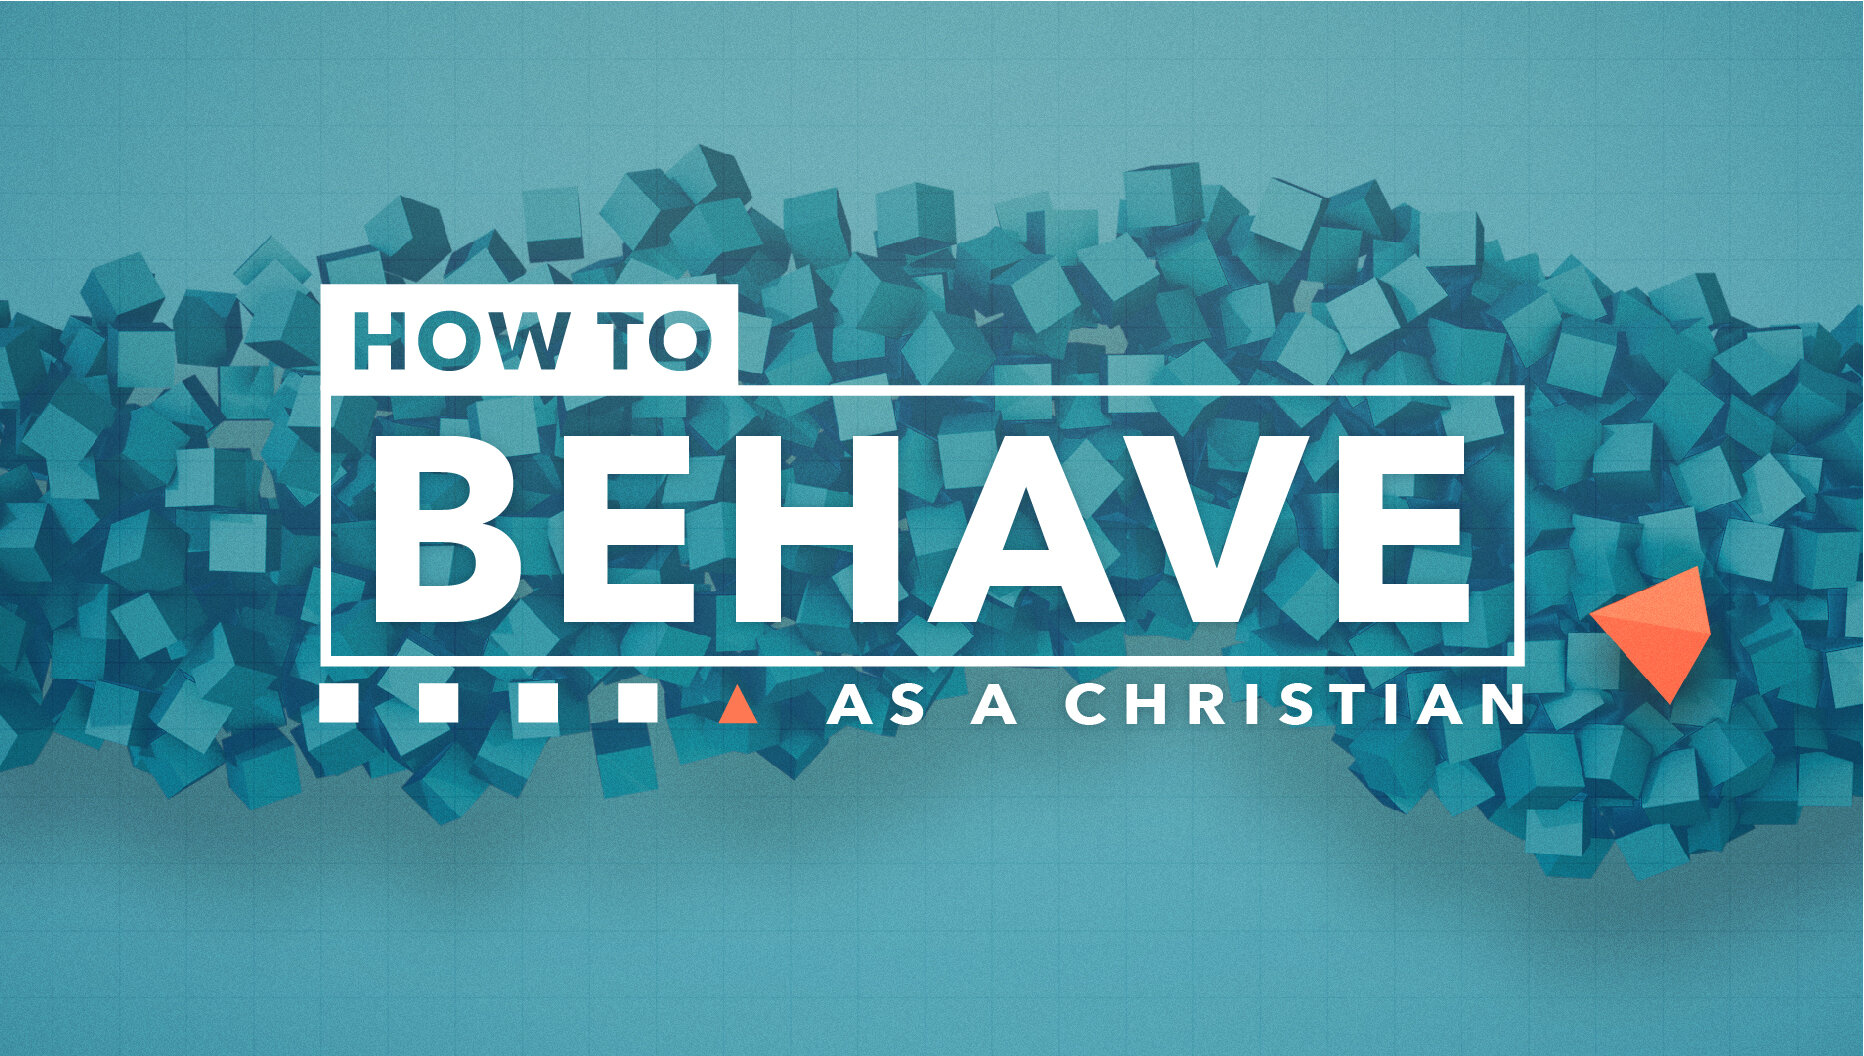 Behave Ttl.jpg